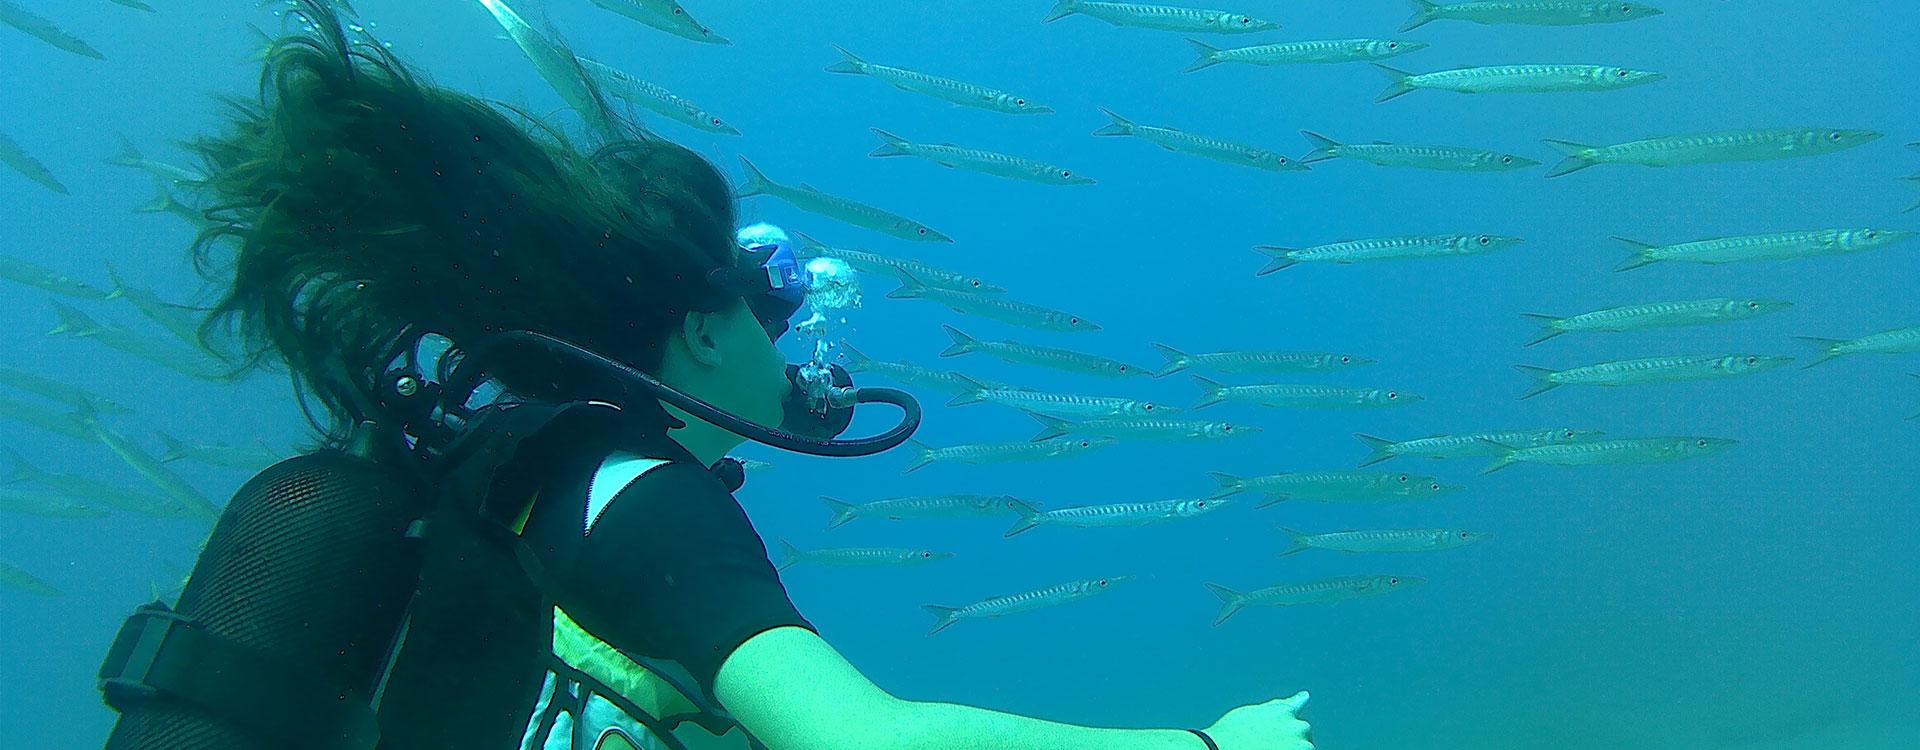 Scuba Diving in Diving Park